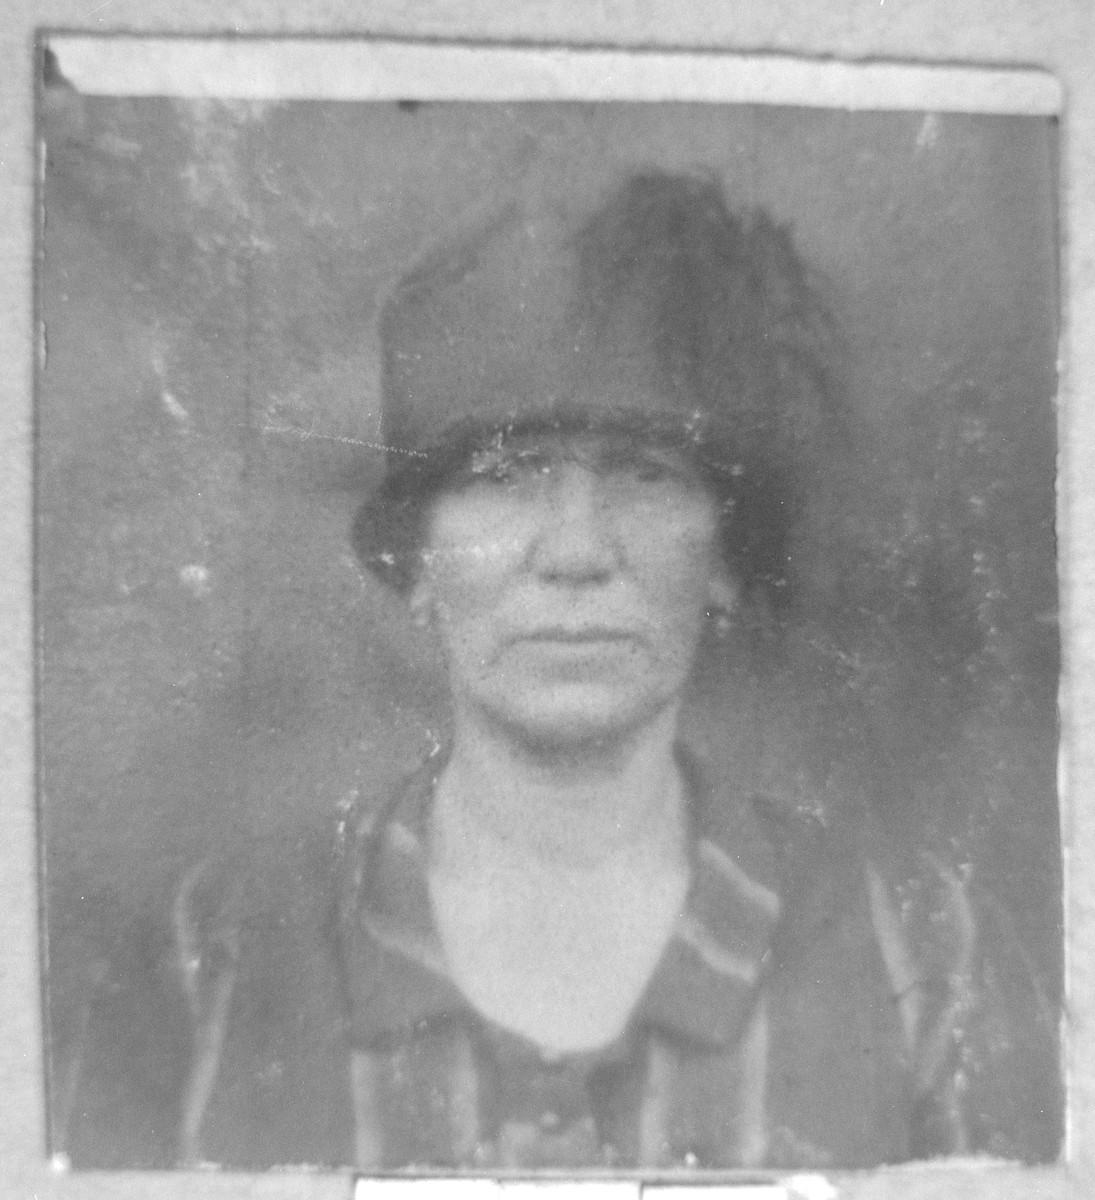 Portrait of Sara Nachmias.  She lived on Dalmatinska in Bitola.